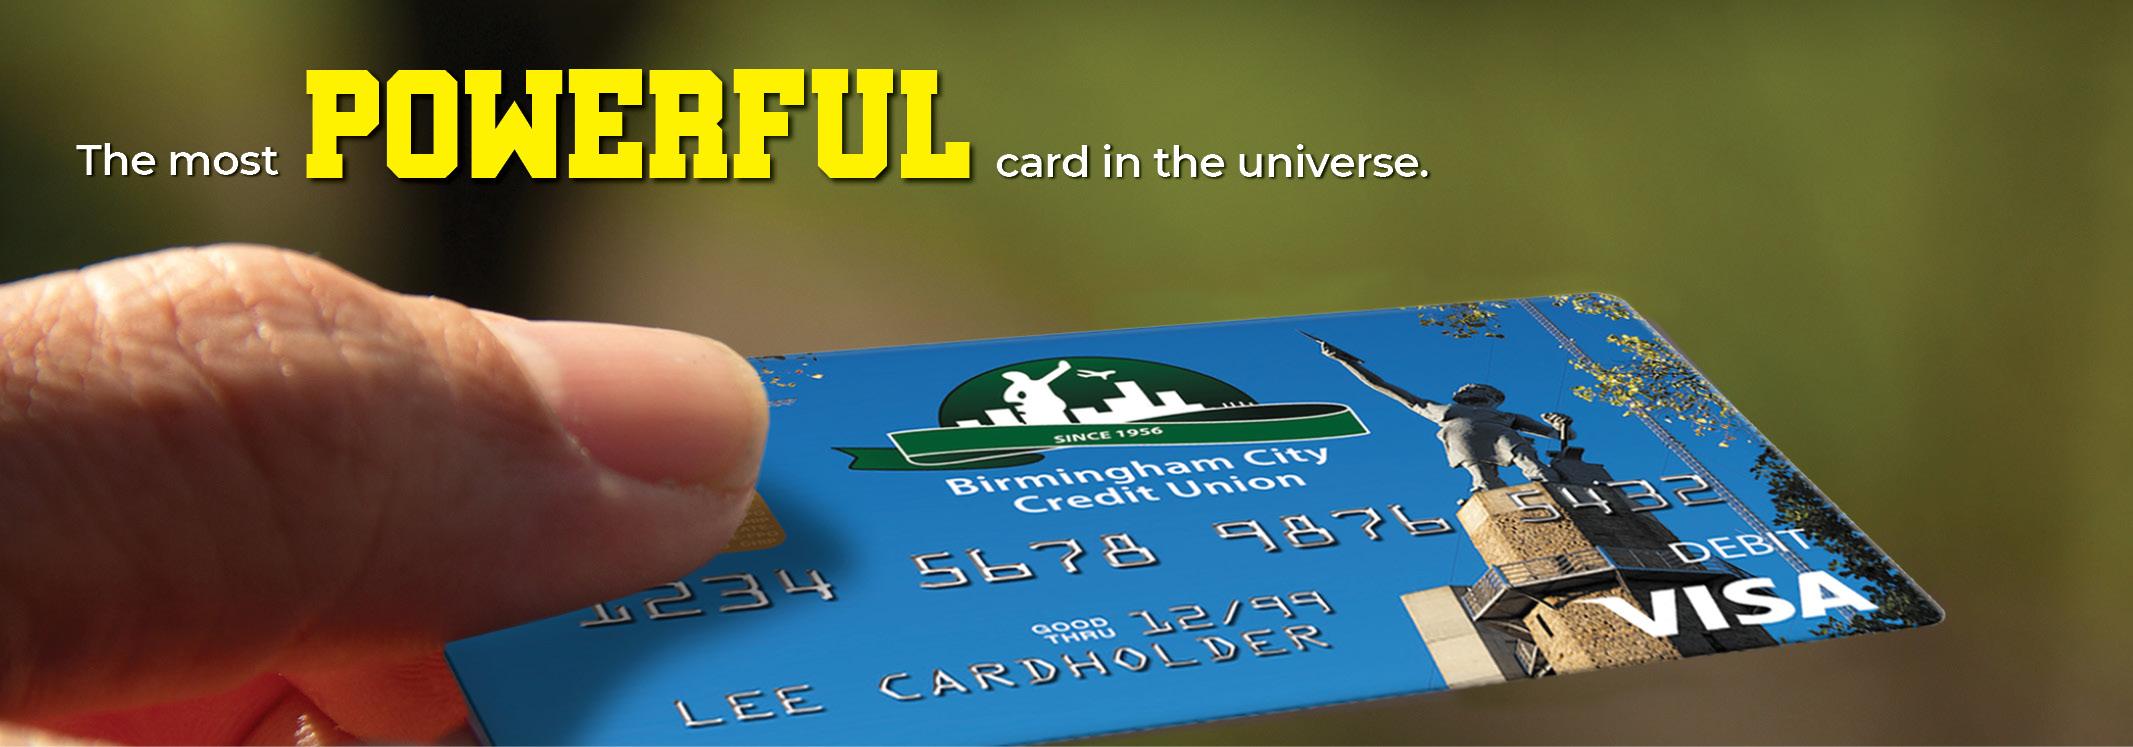 Debit card image slide